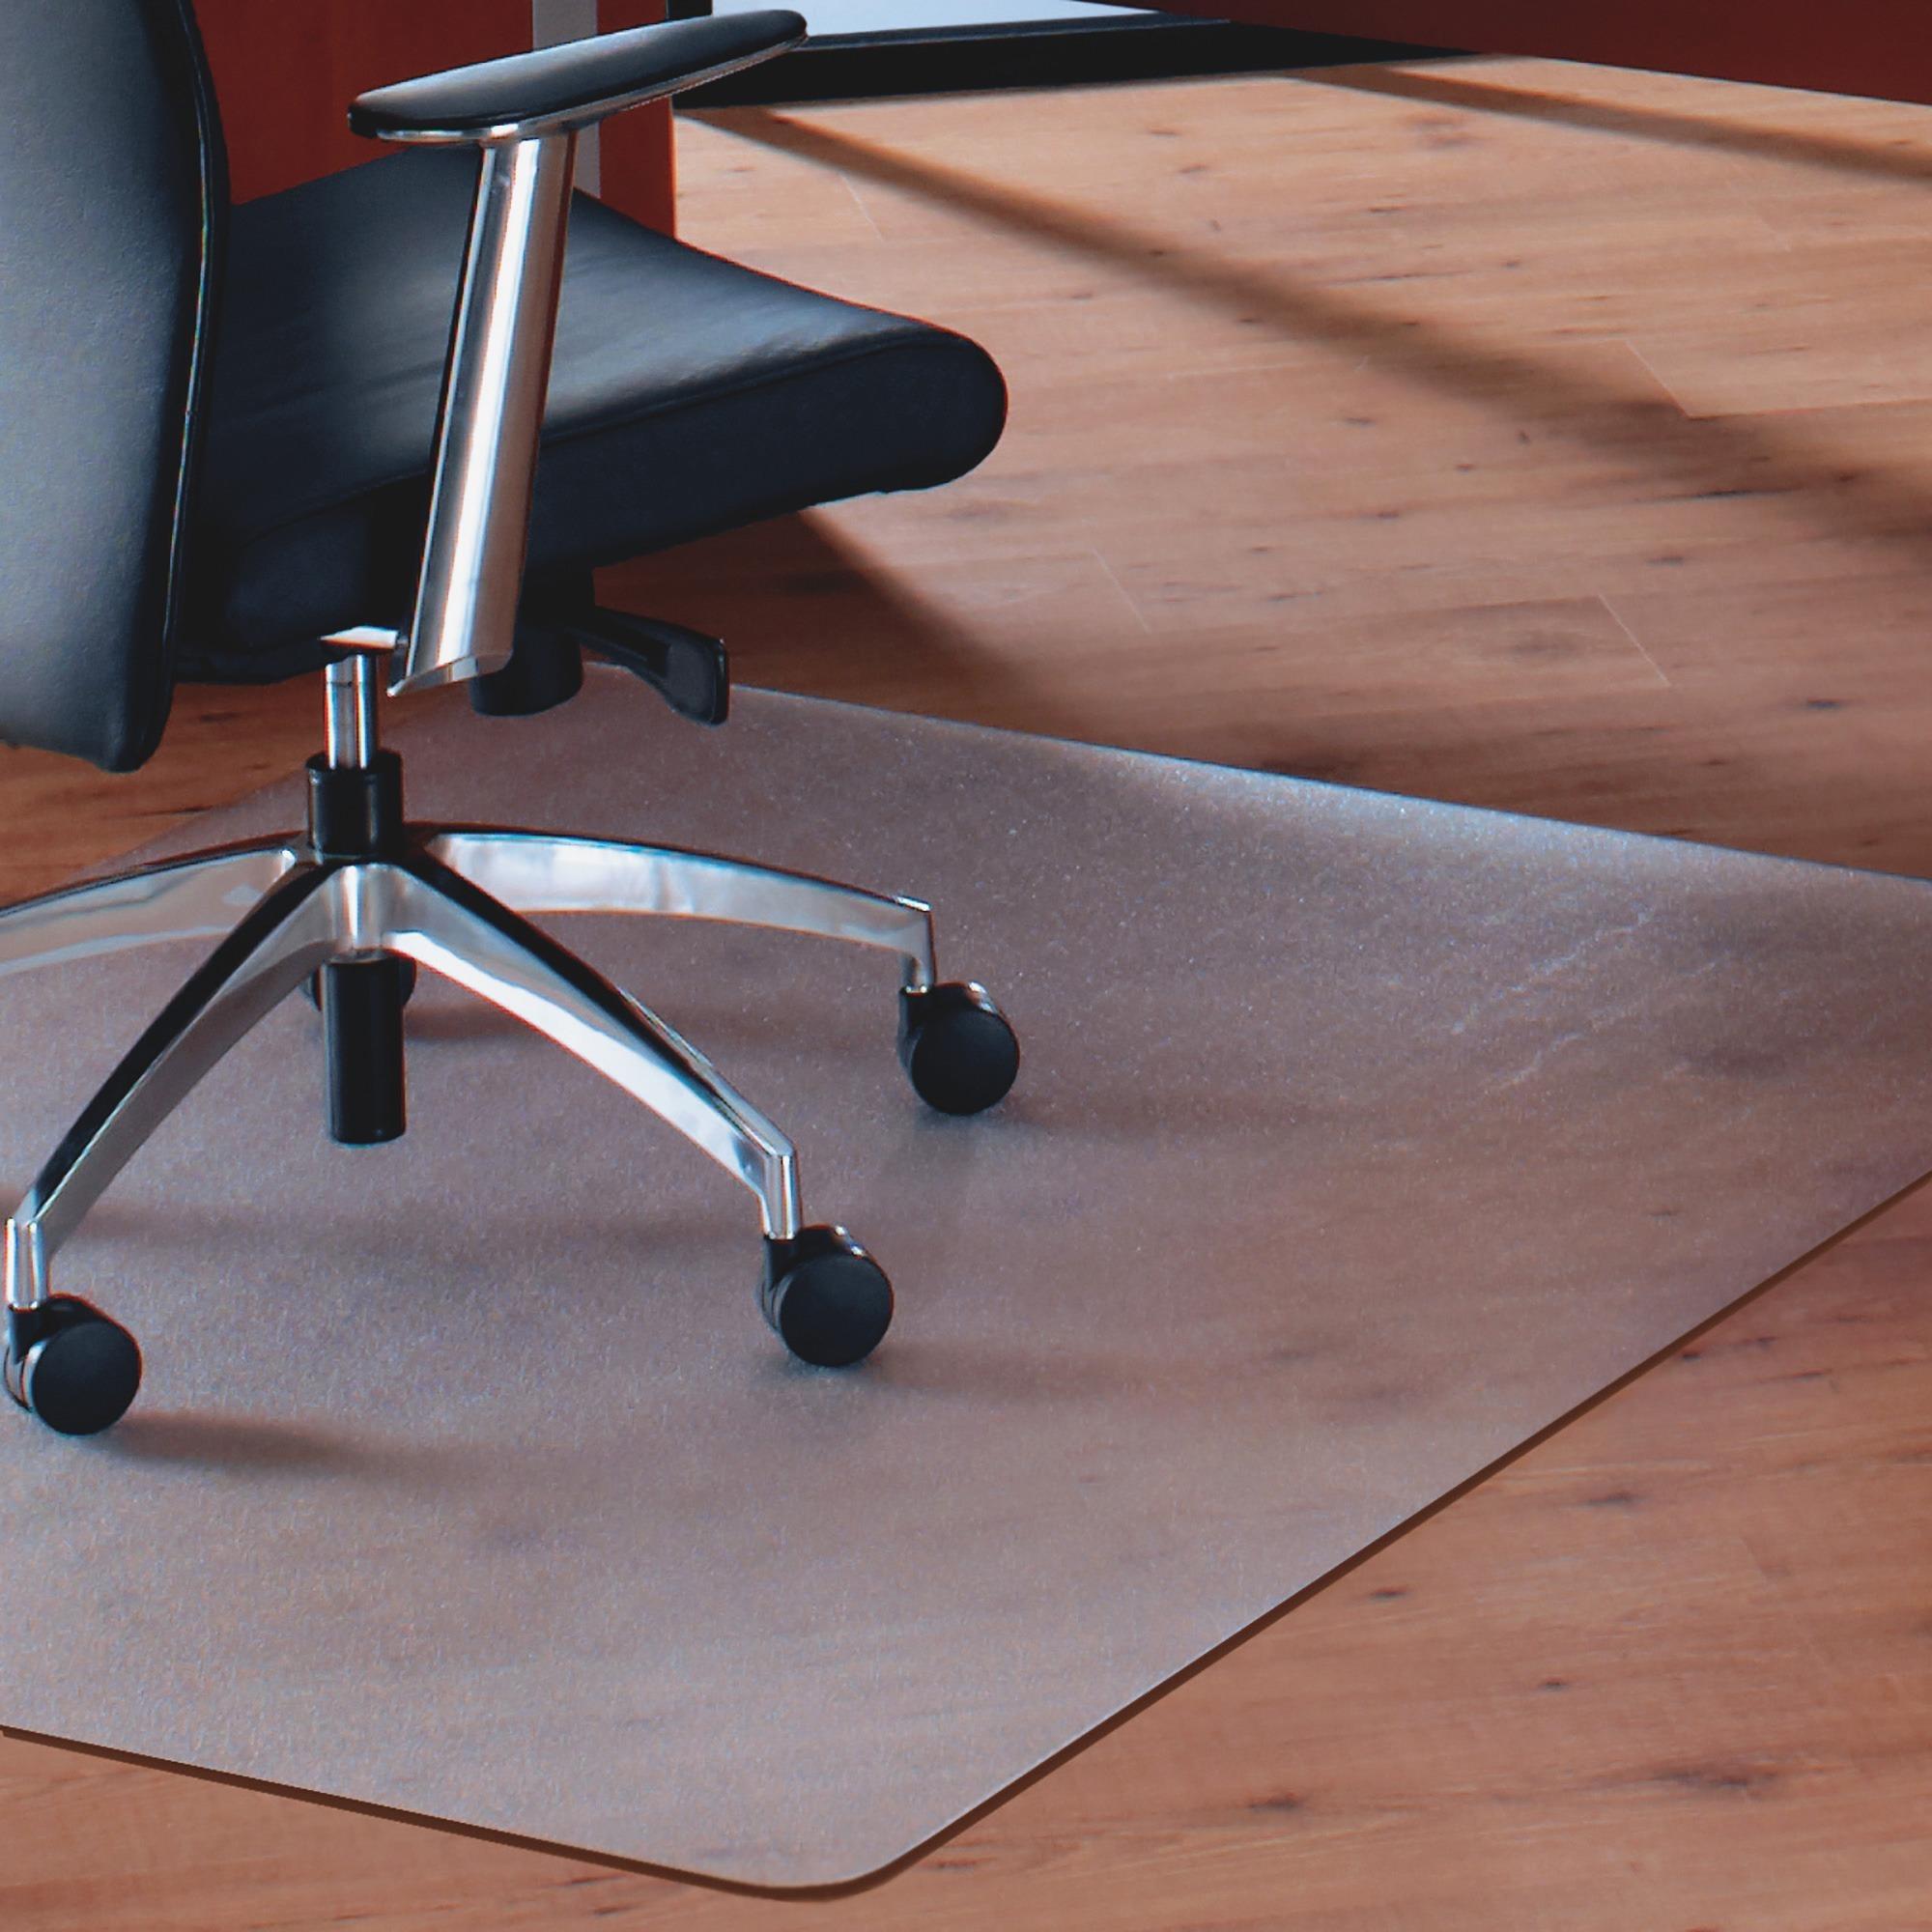 power surge technologies ltd furniture chairs chair mats